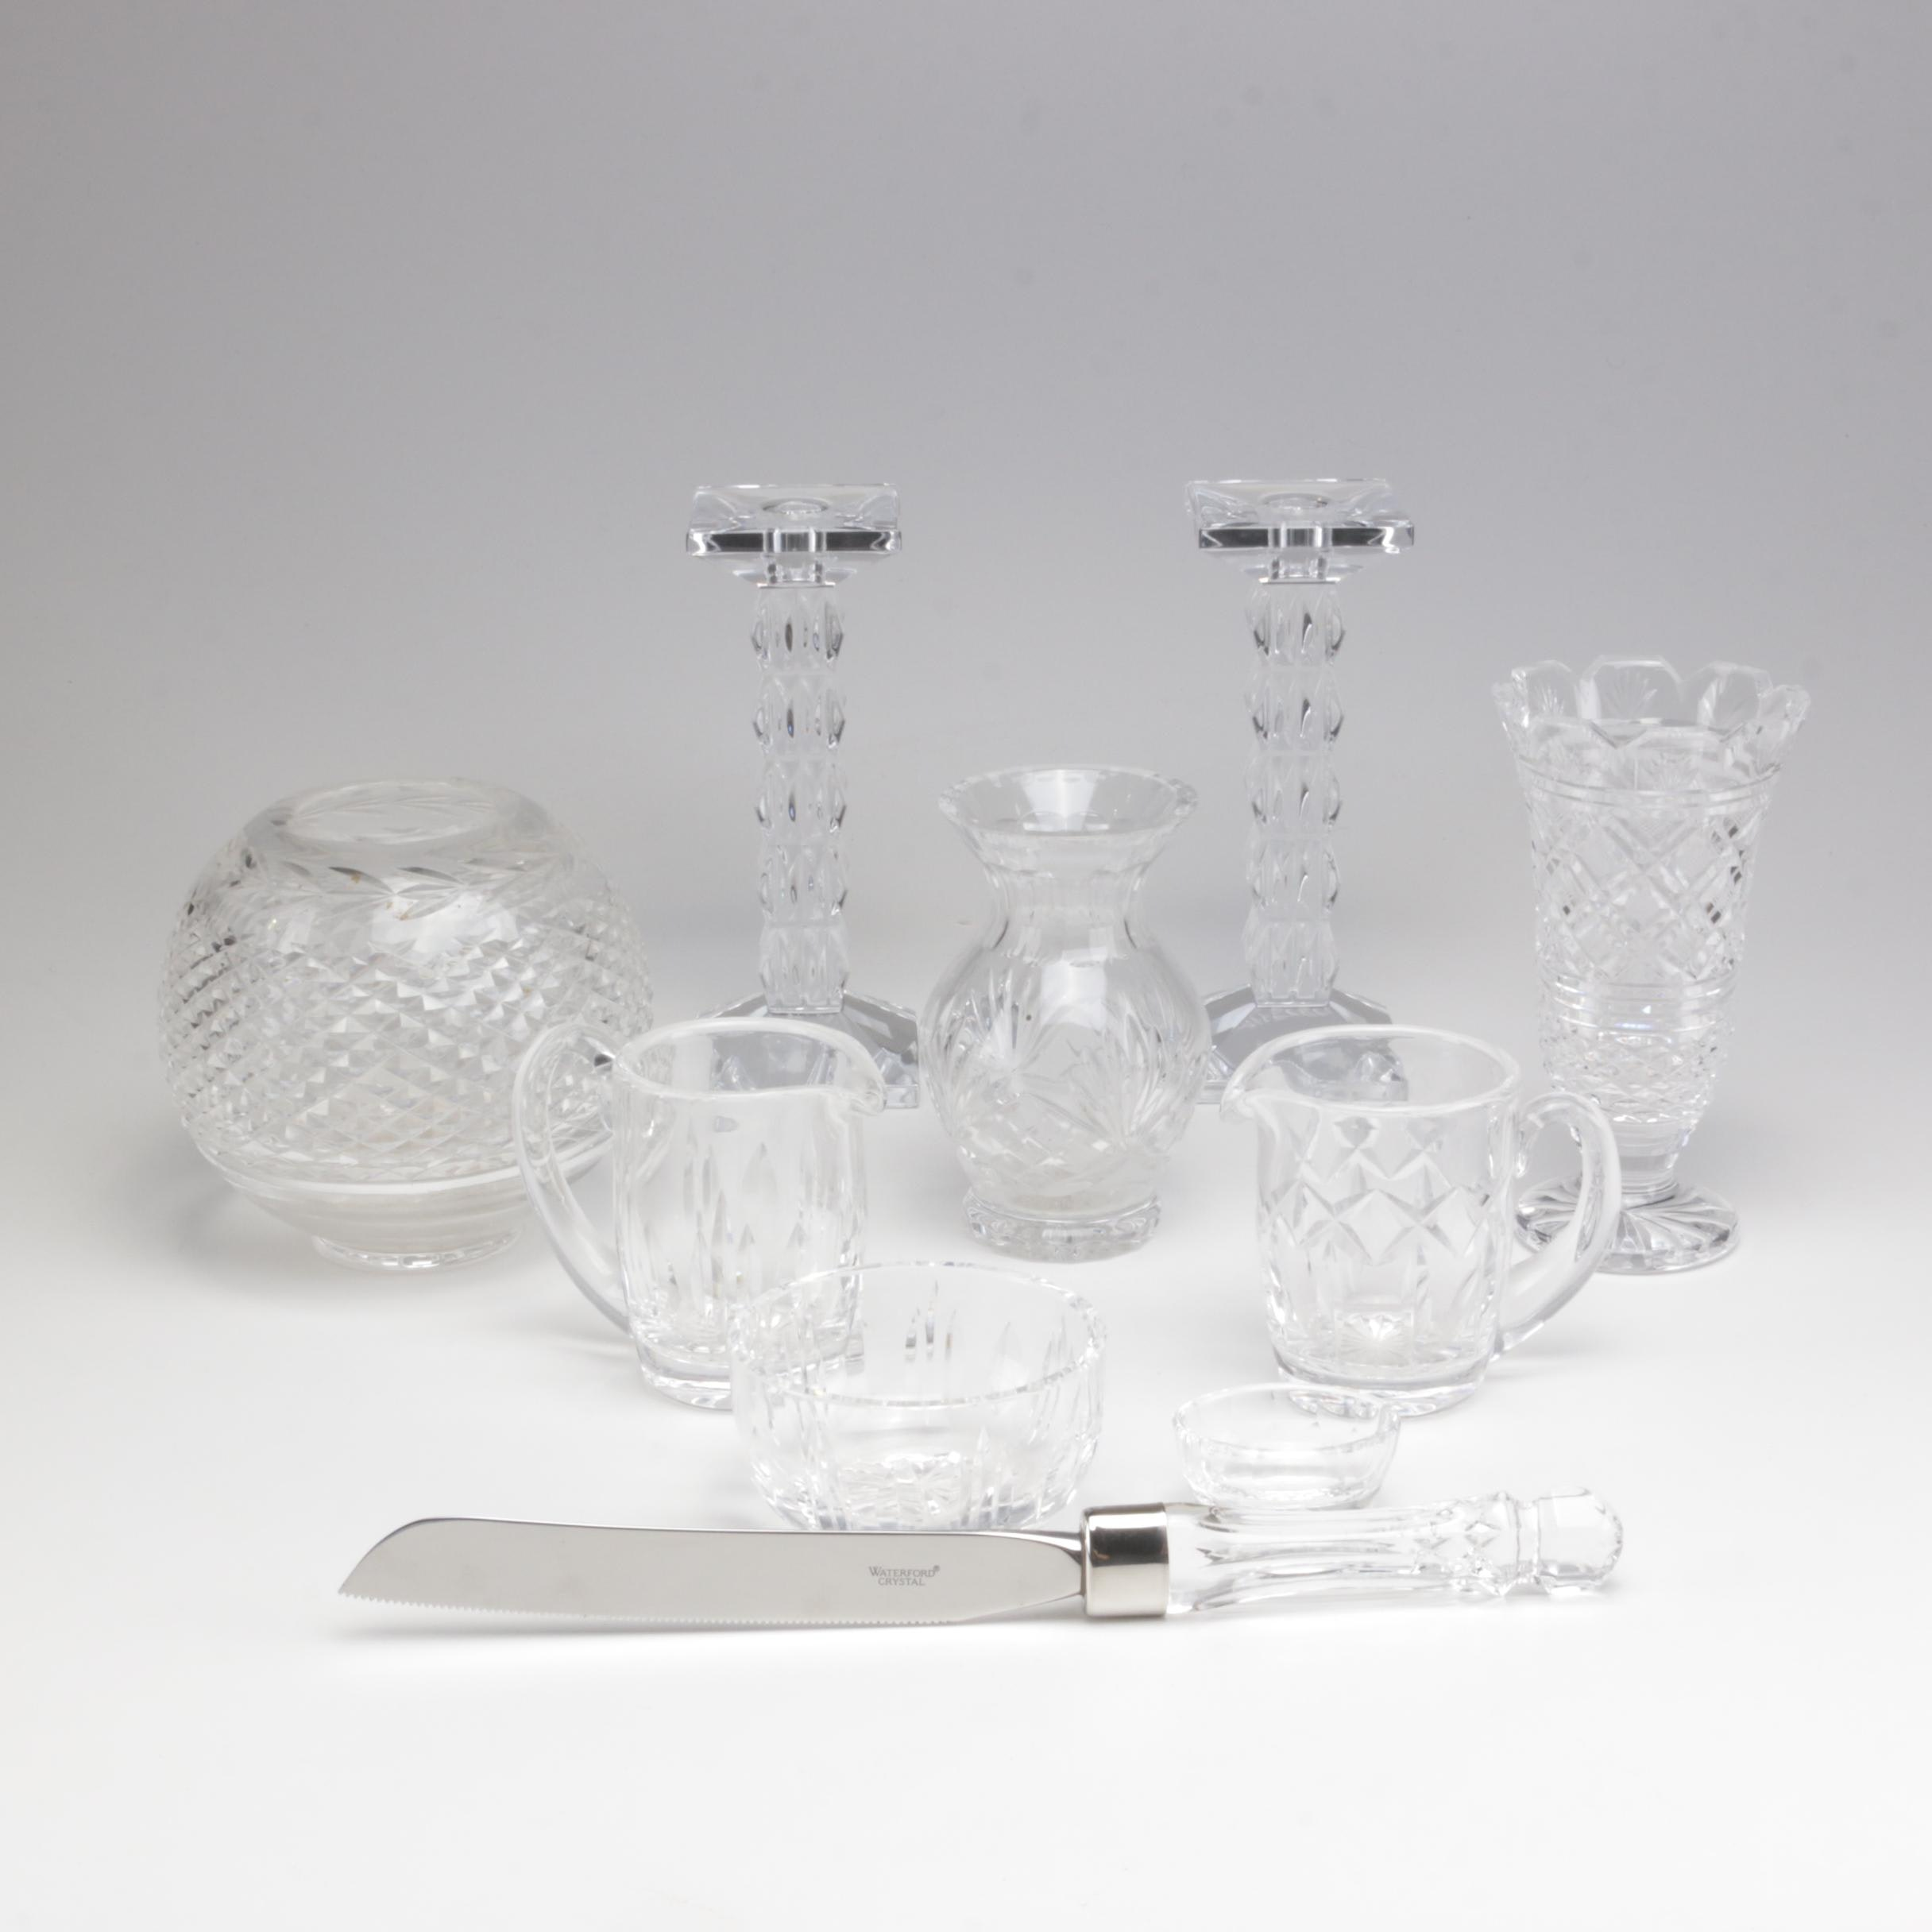 Waterford Crystal Vases, Candlesticks and Serveware